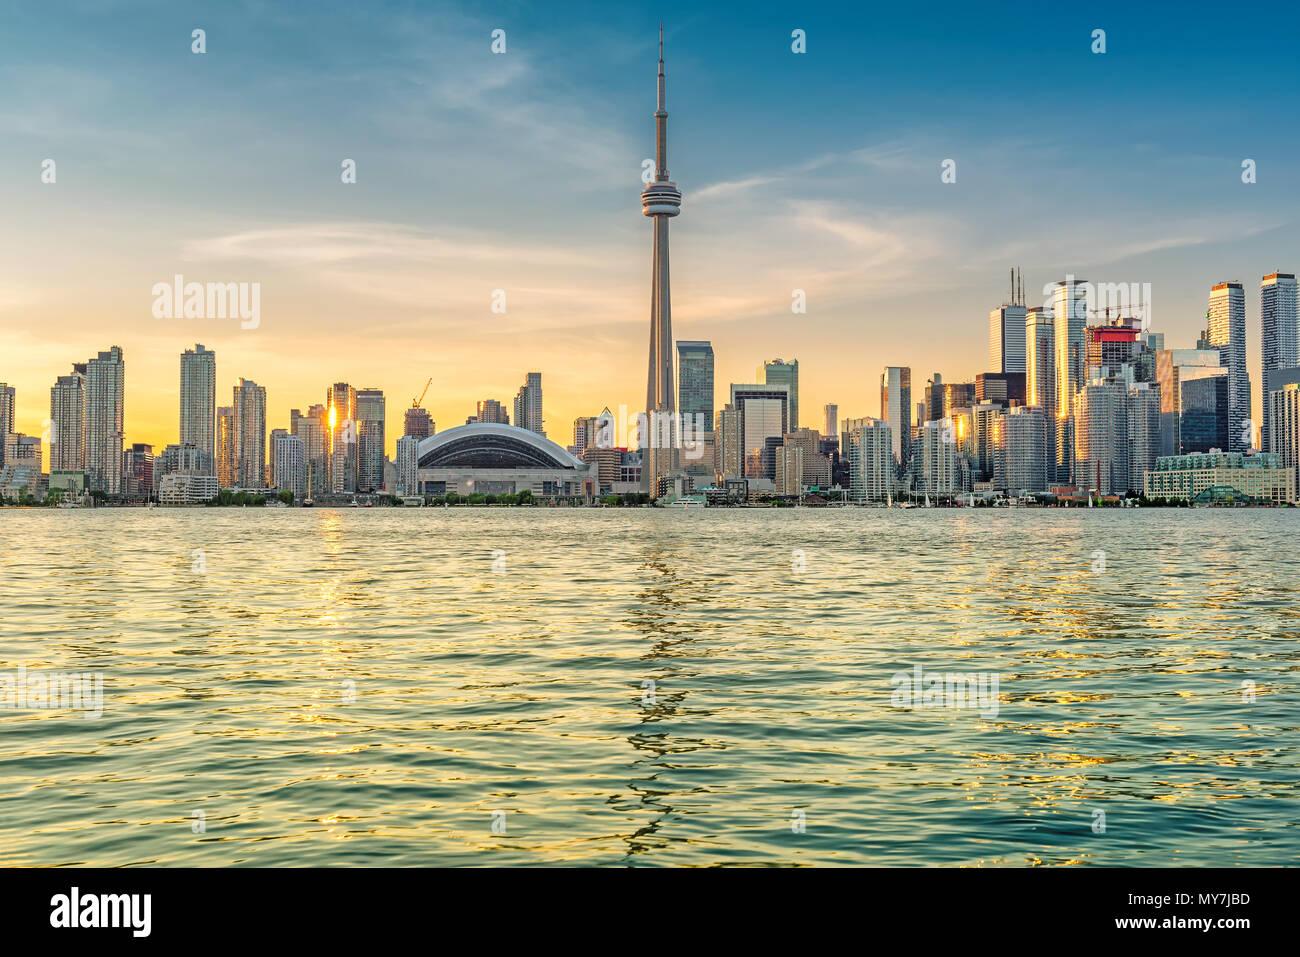 Toronto City skyline at sunset in Toronto, Ontario, Canada. - Stock Image